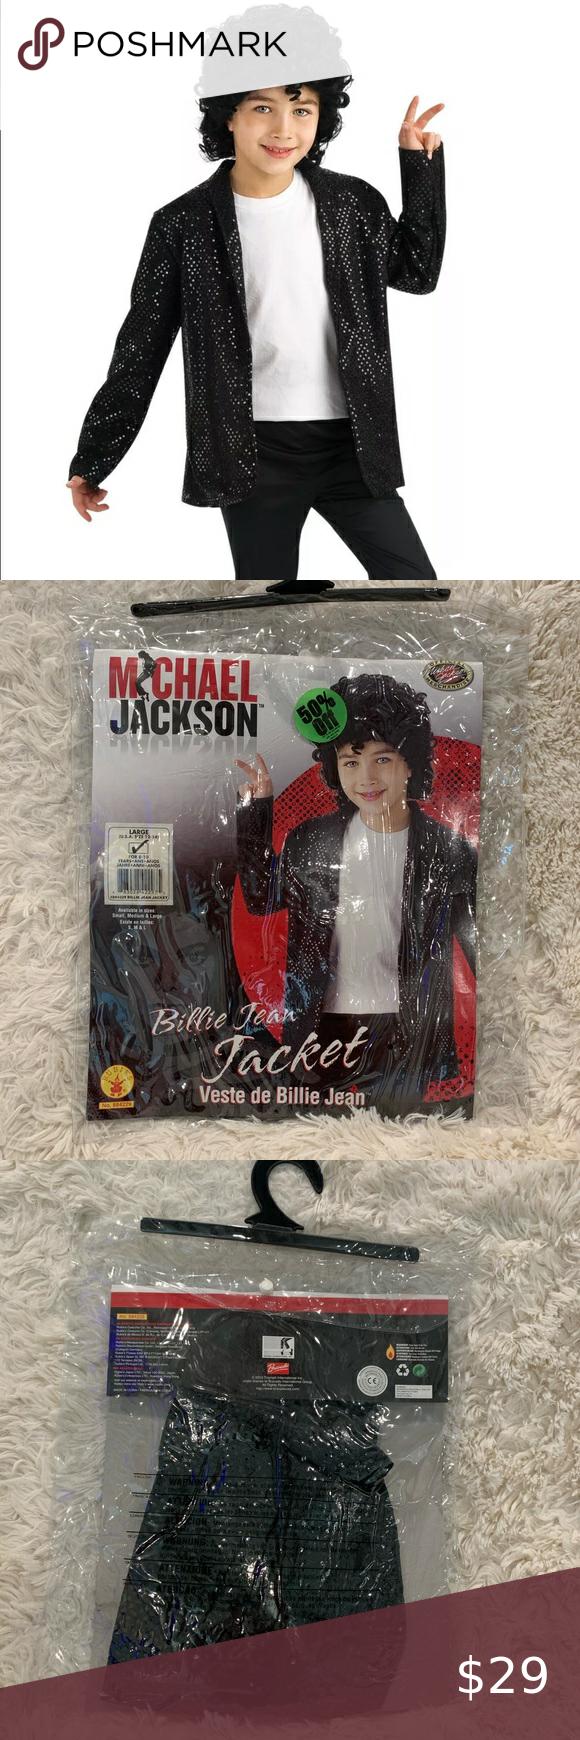 Michael Jackson Billie Jean Jacket Child Costume Kids Jacket Kids Costumes Jean Jacket [ 1740 x 580 Pixel ]